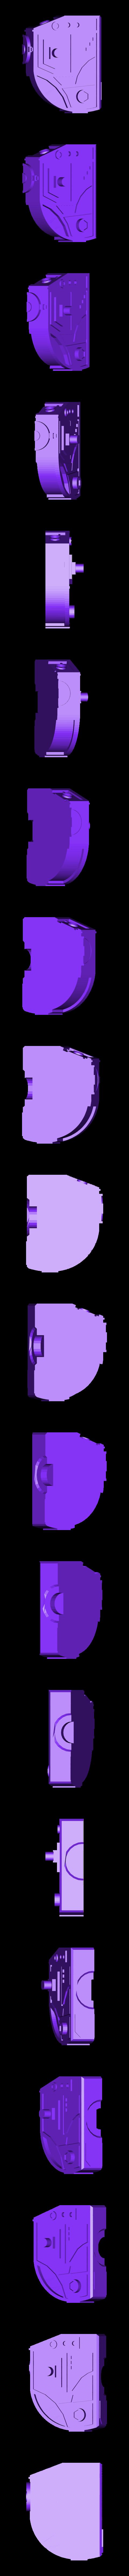 Mech_Face2.stl Download free STL file Mech Warrior • 3D print object, Snorri